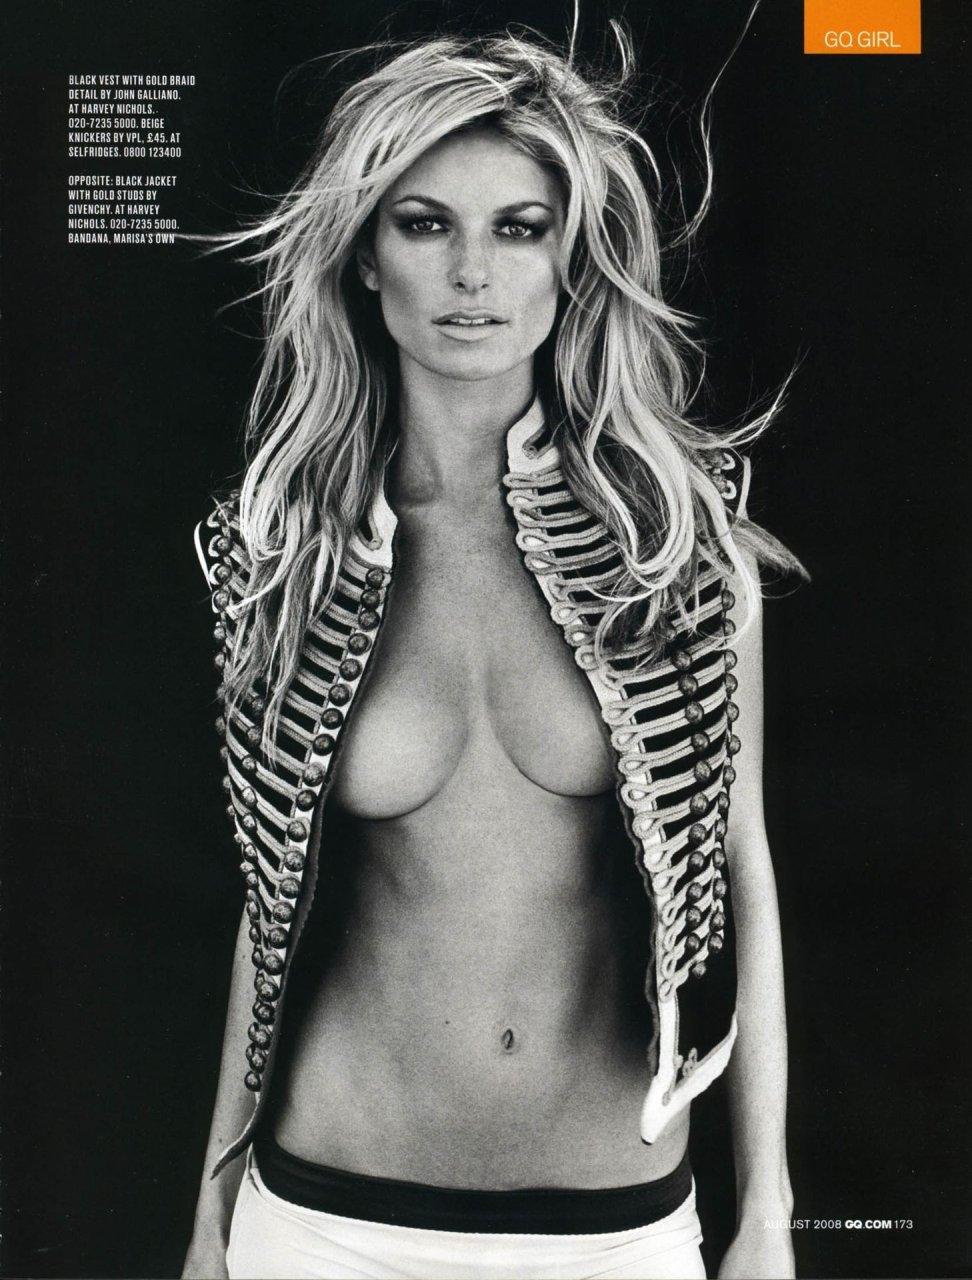 Marisa-Miller-Nude-TheFappeningBlog.com-22.jpg